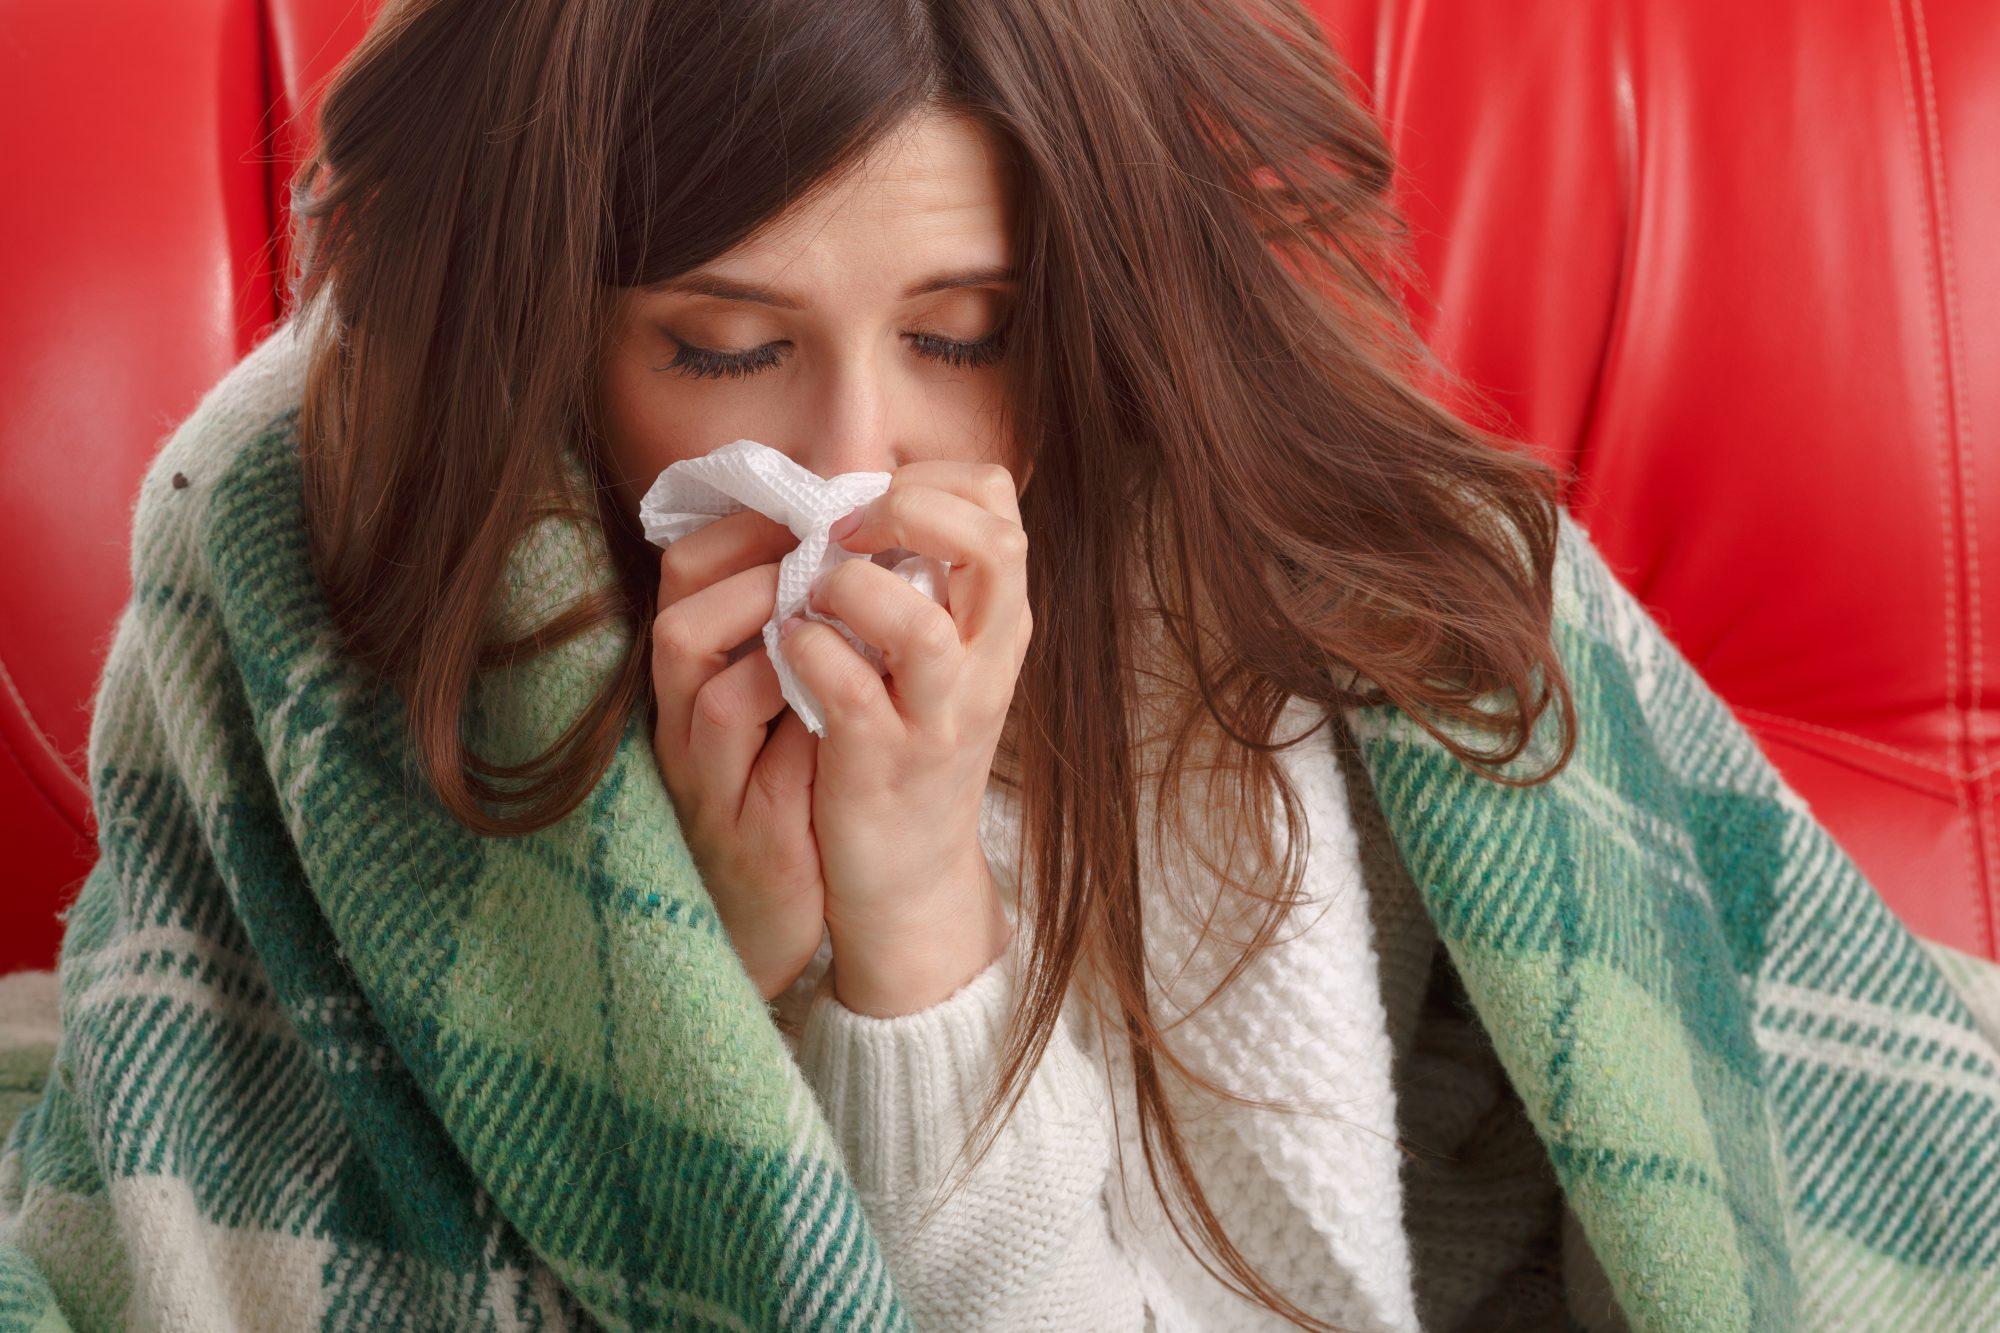 Grippe,Influenza - Naturheilpraxis Sylvia Böhnlein in Bamberg